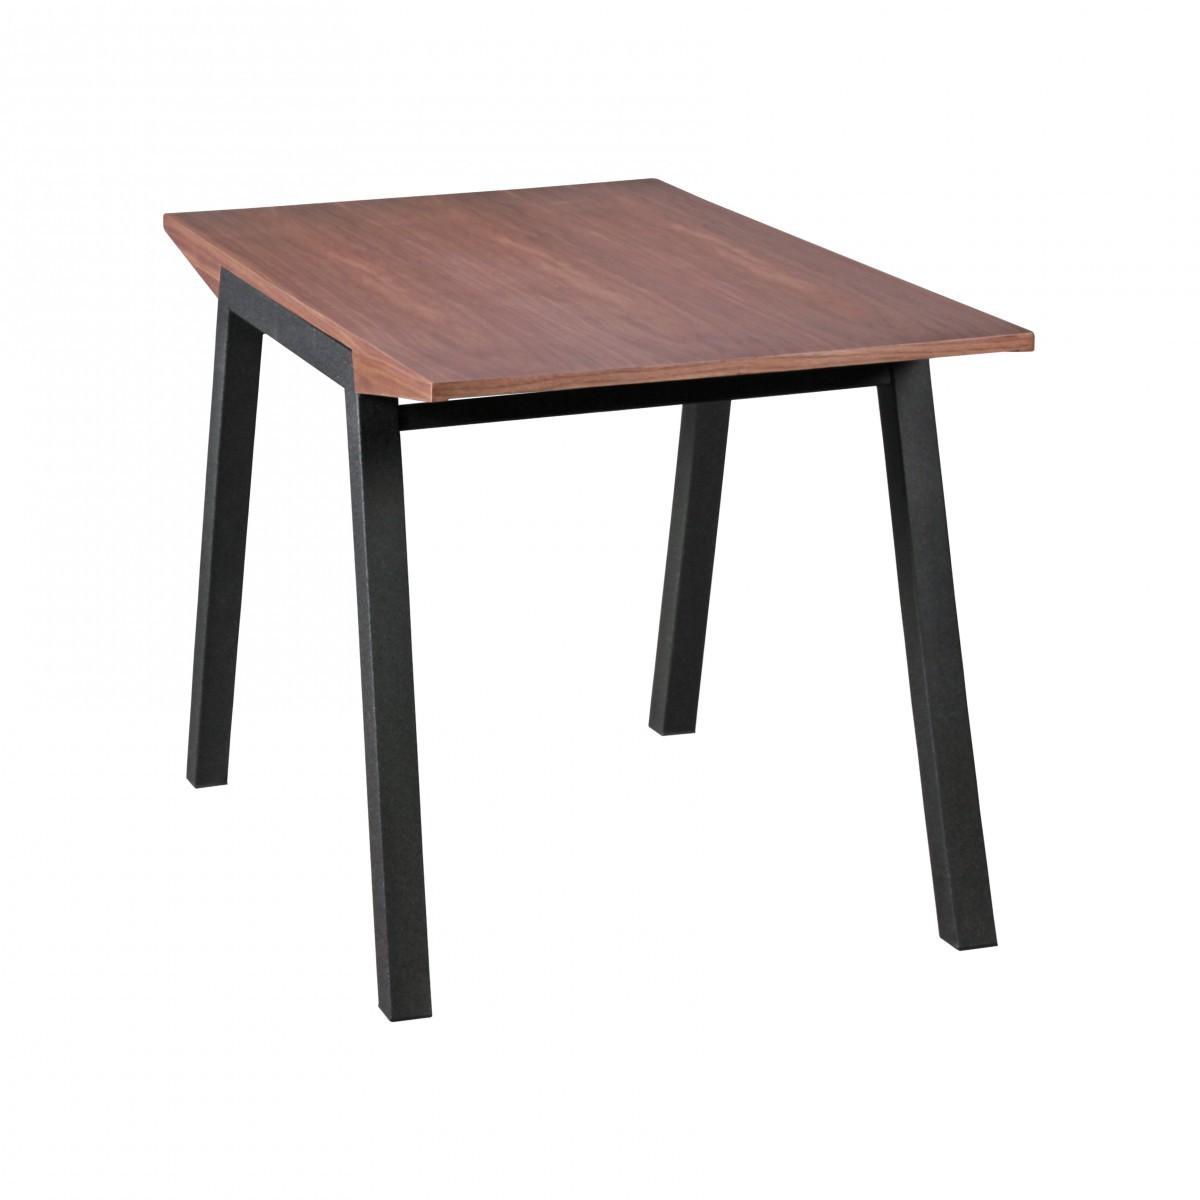 Finebuy table en noyer table de mdf table de cuisine 120cm for Table cuisine 70 x 120